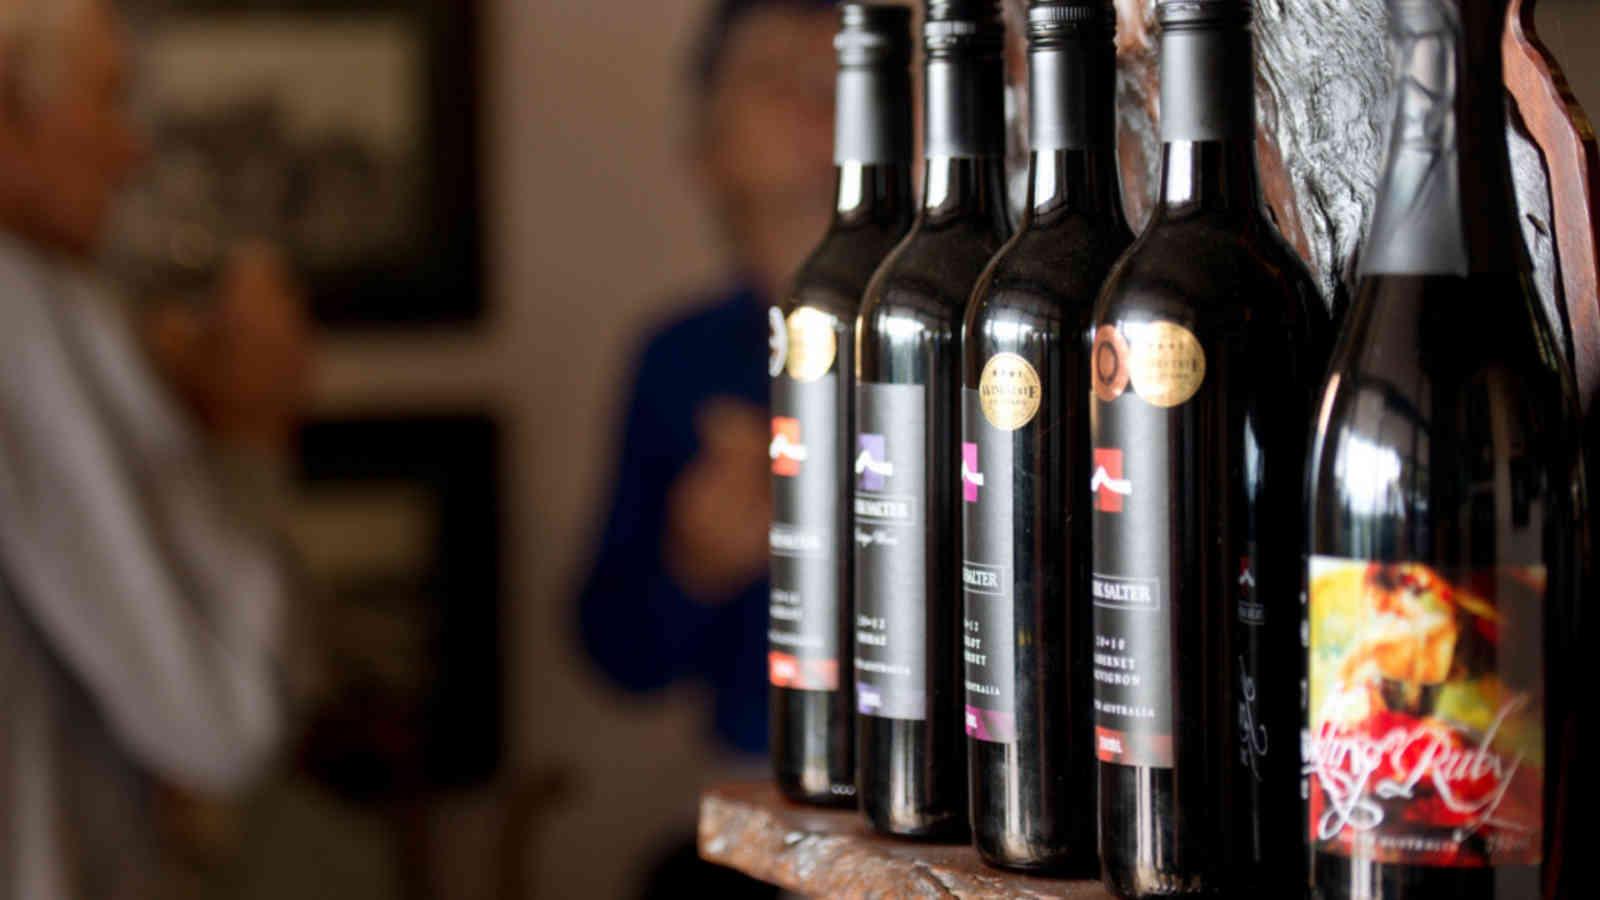 Burk Salter Wines